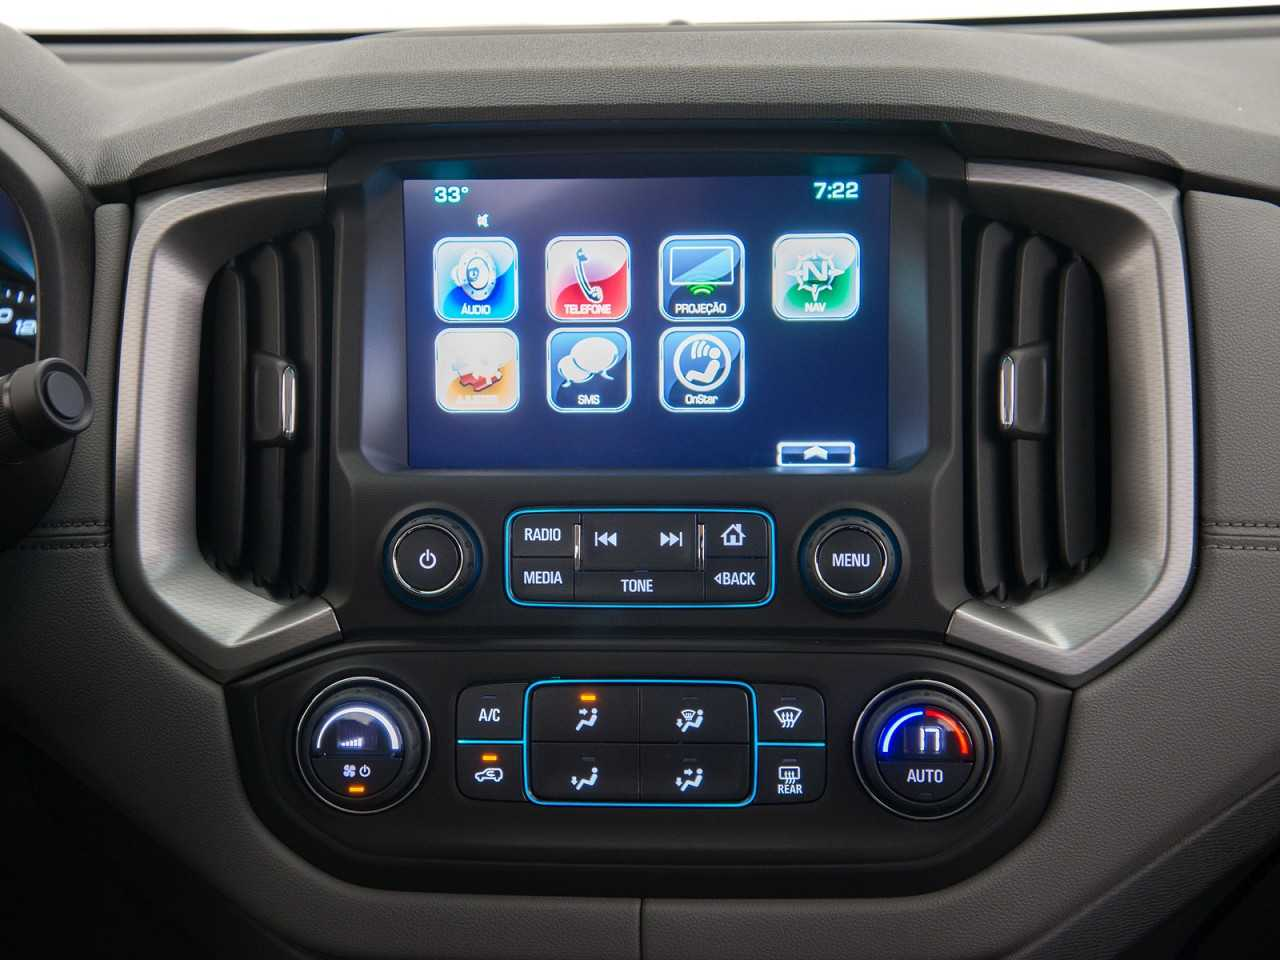 ChevroletS10 2018 - console central